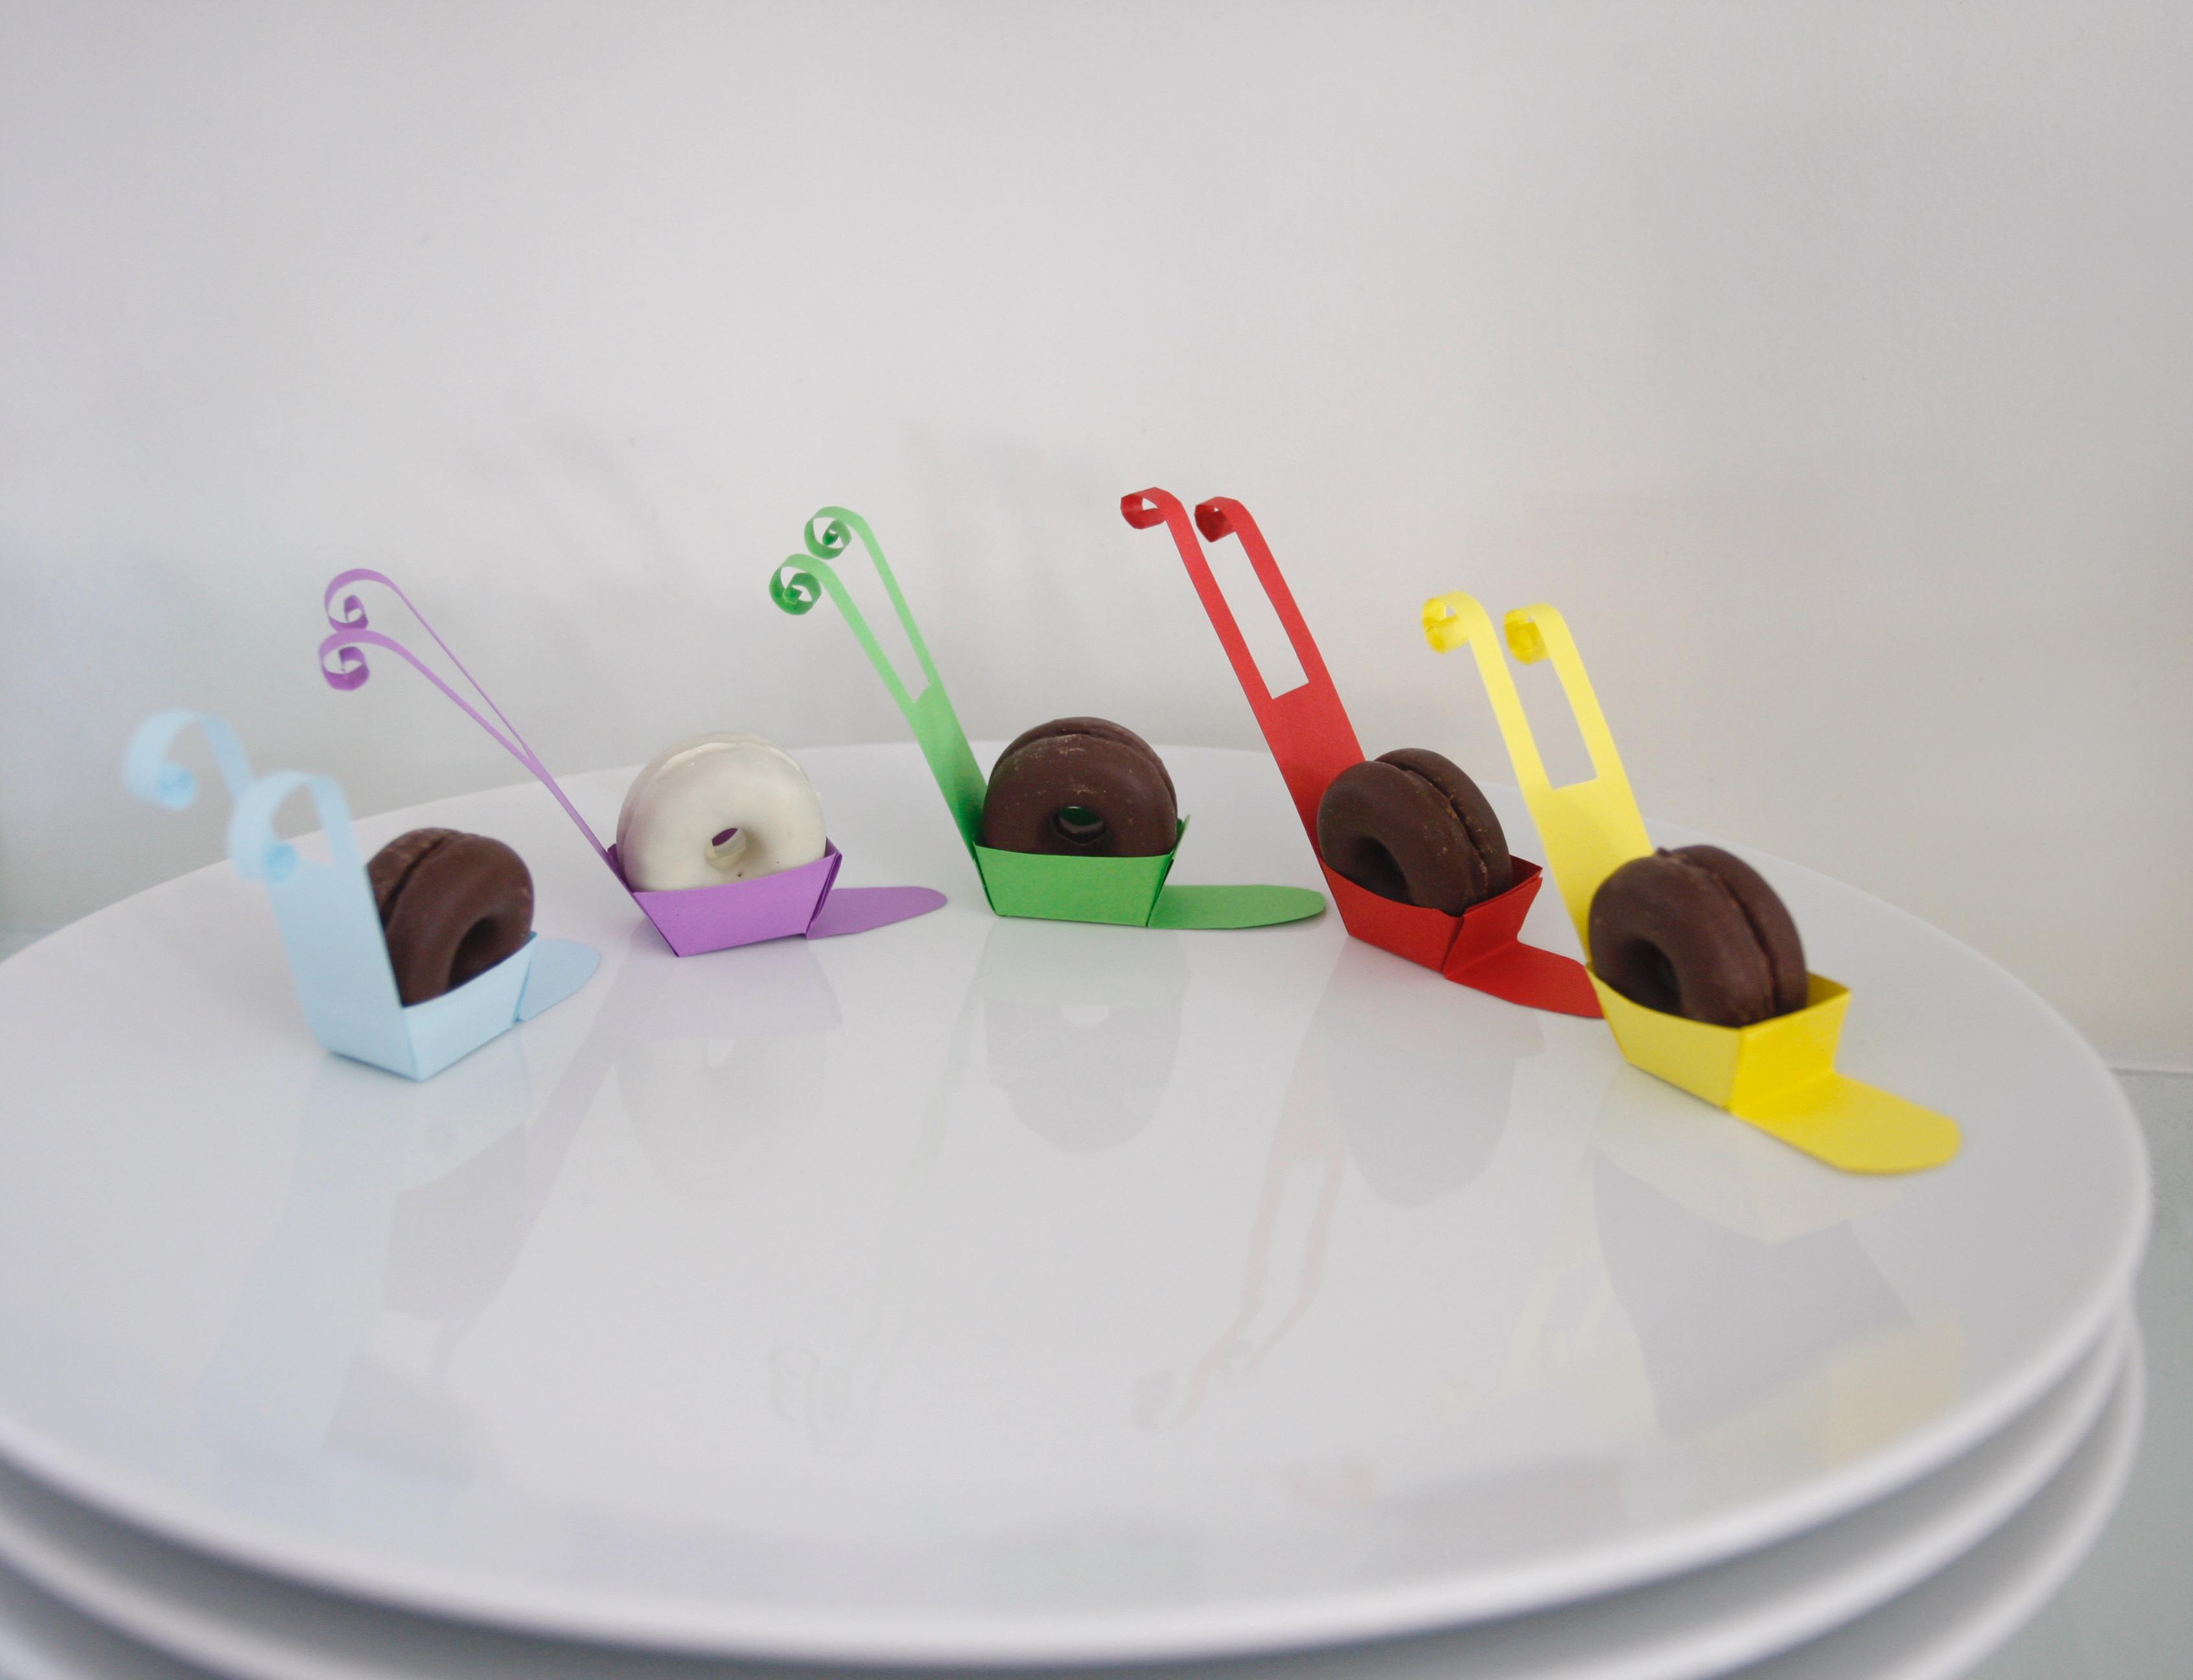 Kinder deko  filipinos kekse galletas schnecke snail caracol paper papel papier ...